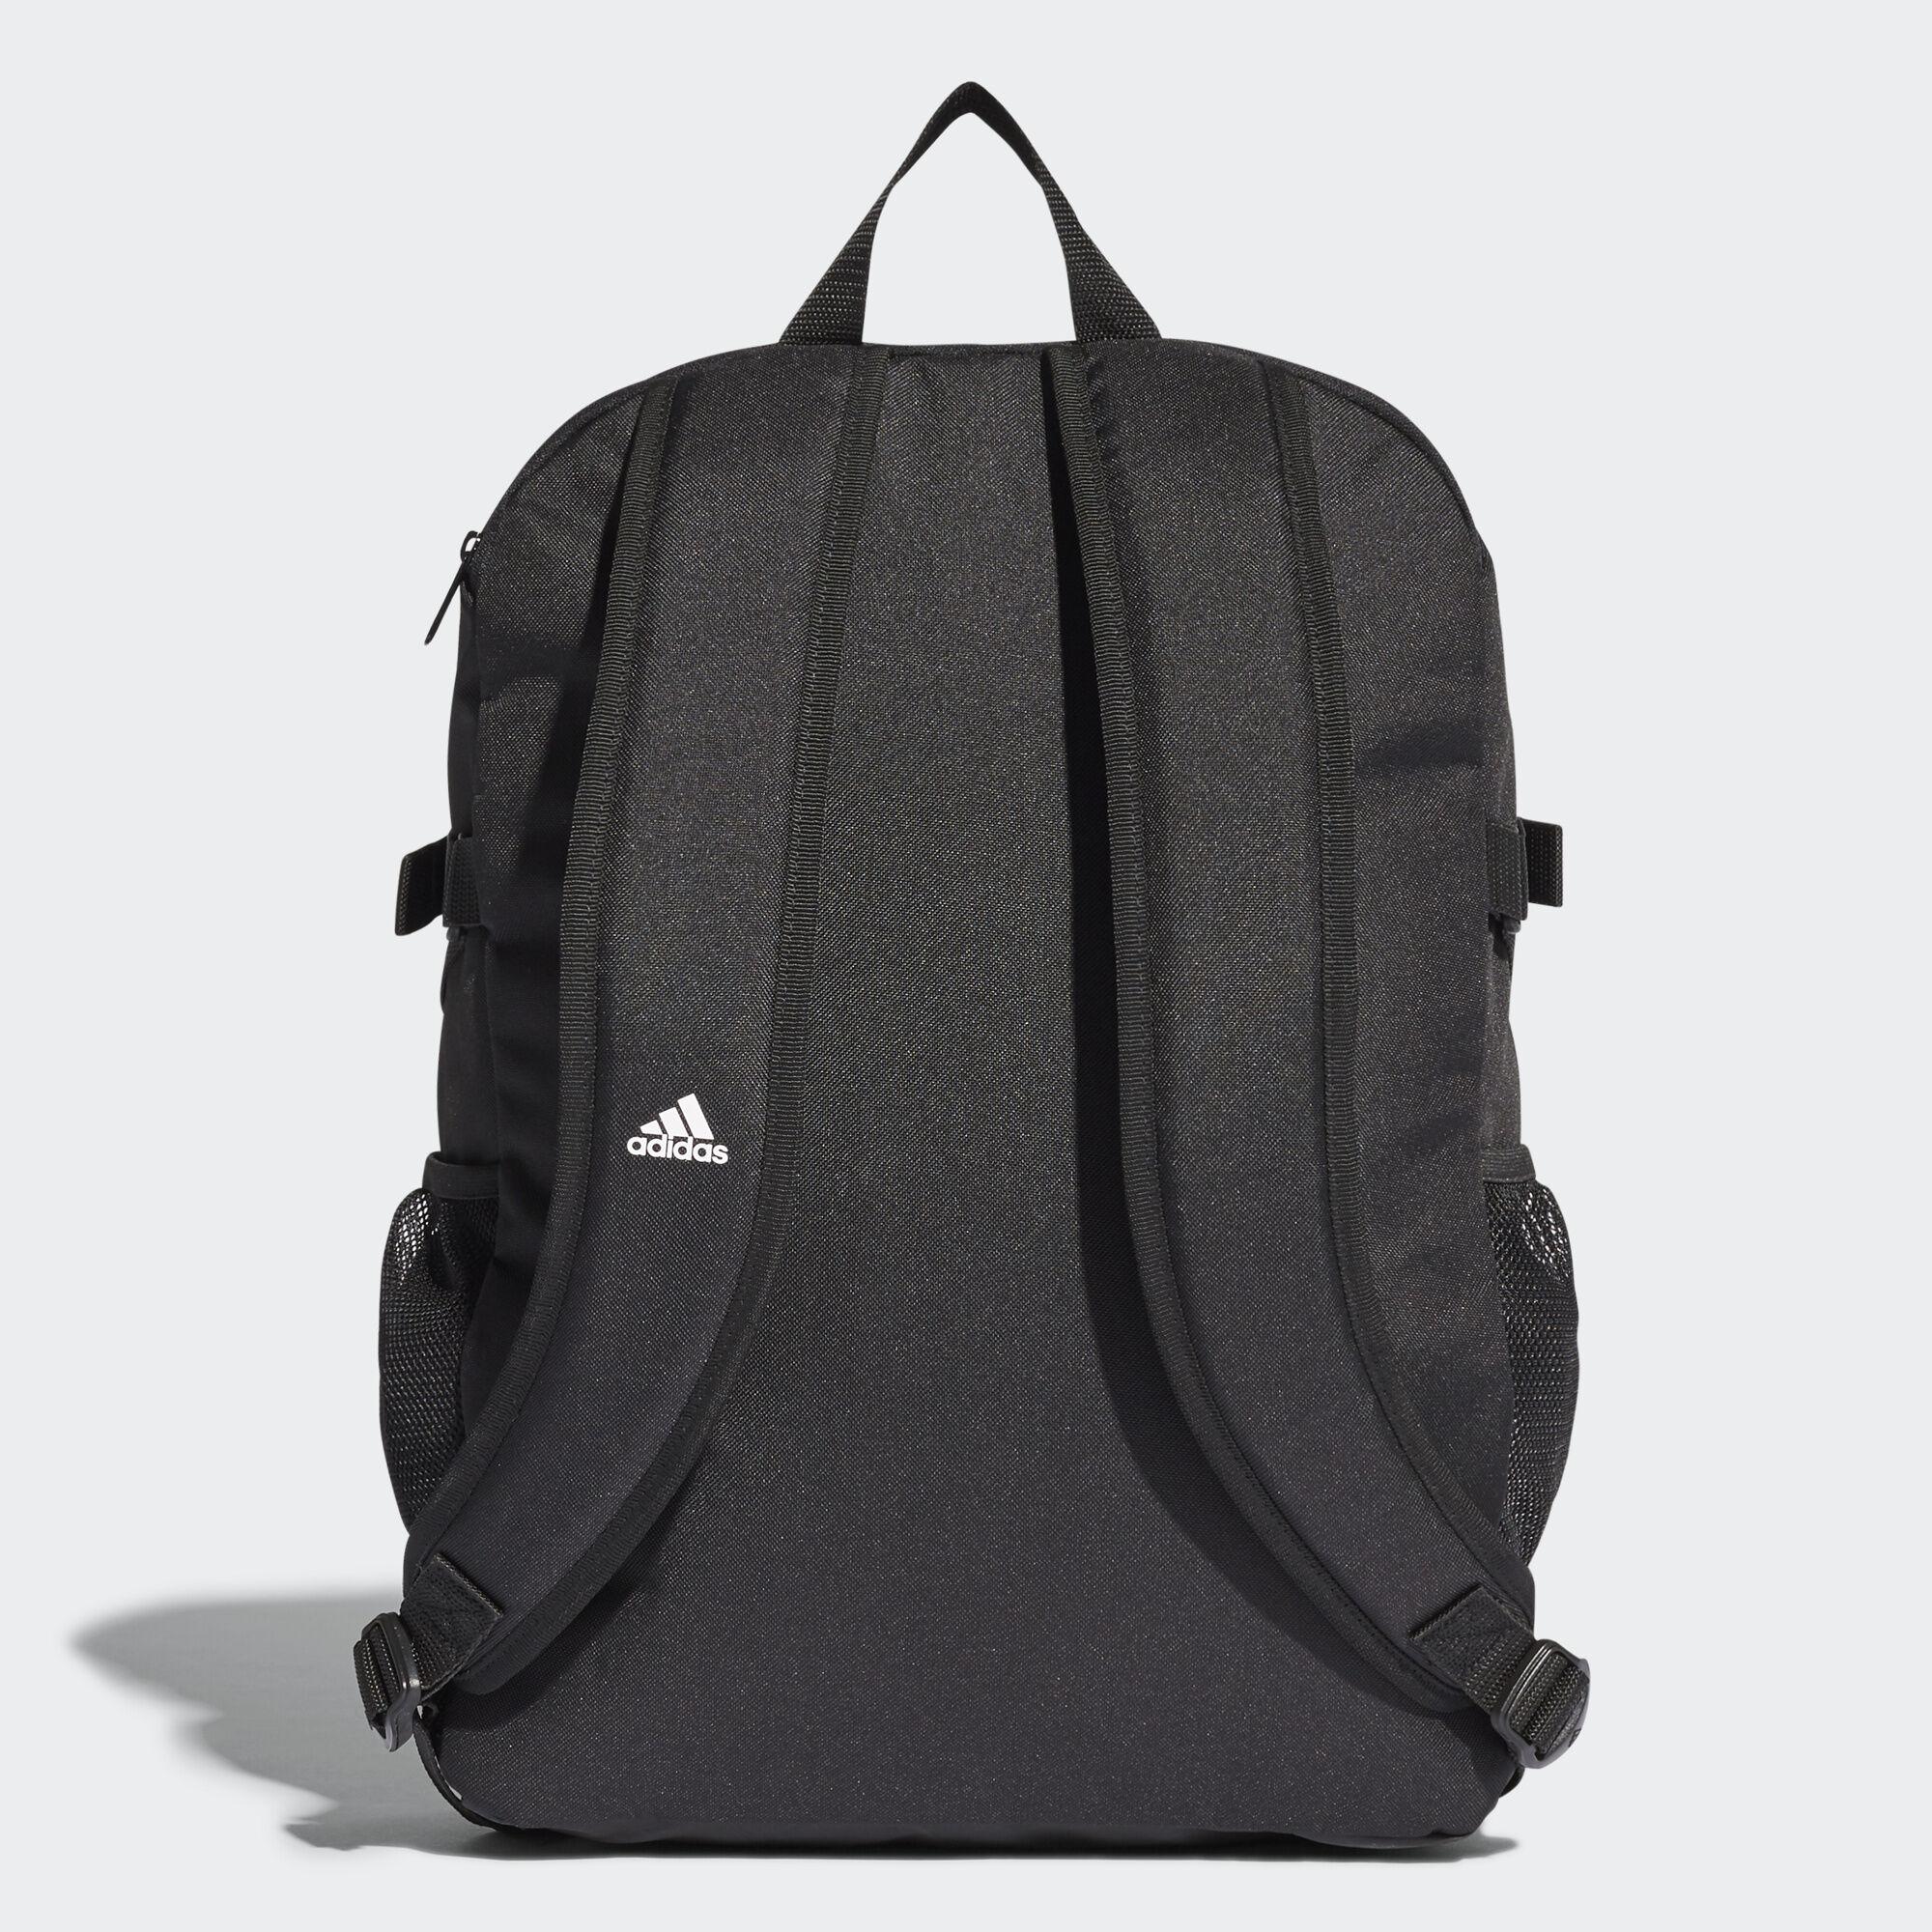 09ae1e9be841 adidas 3-Stripes Power Backpack Medium - Blue